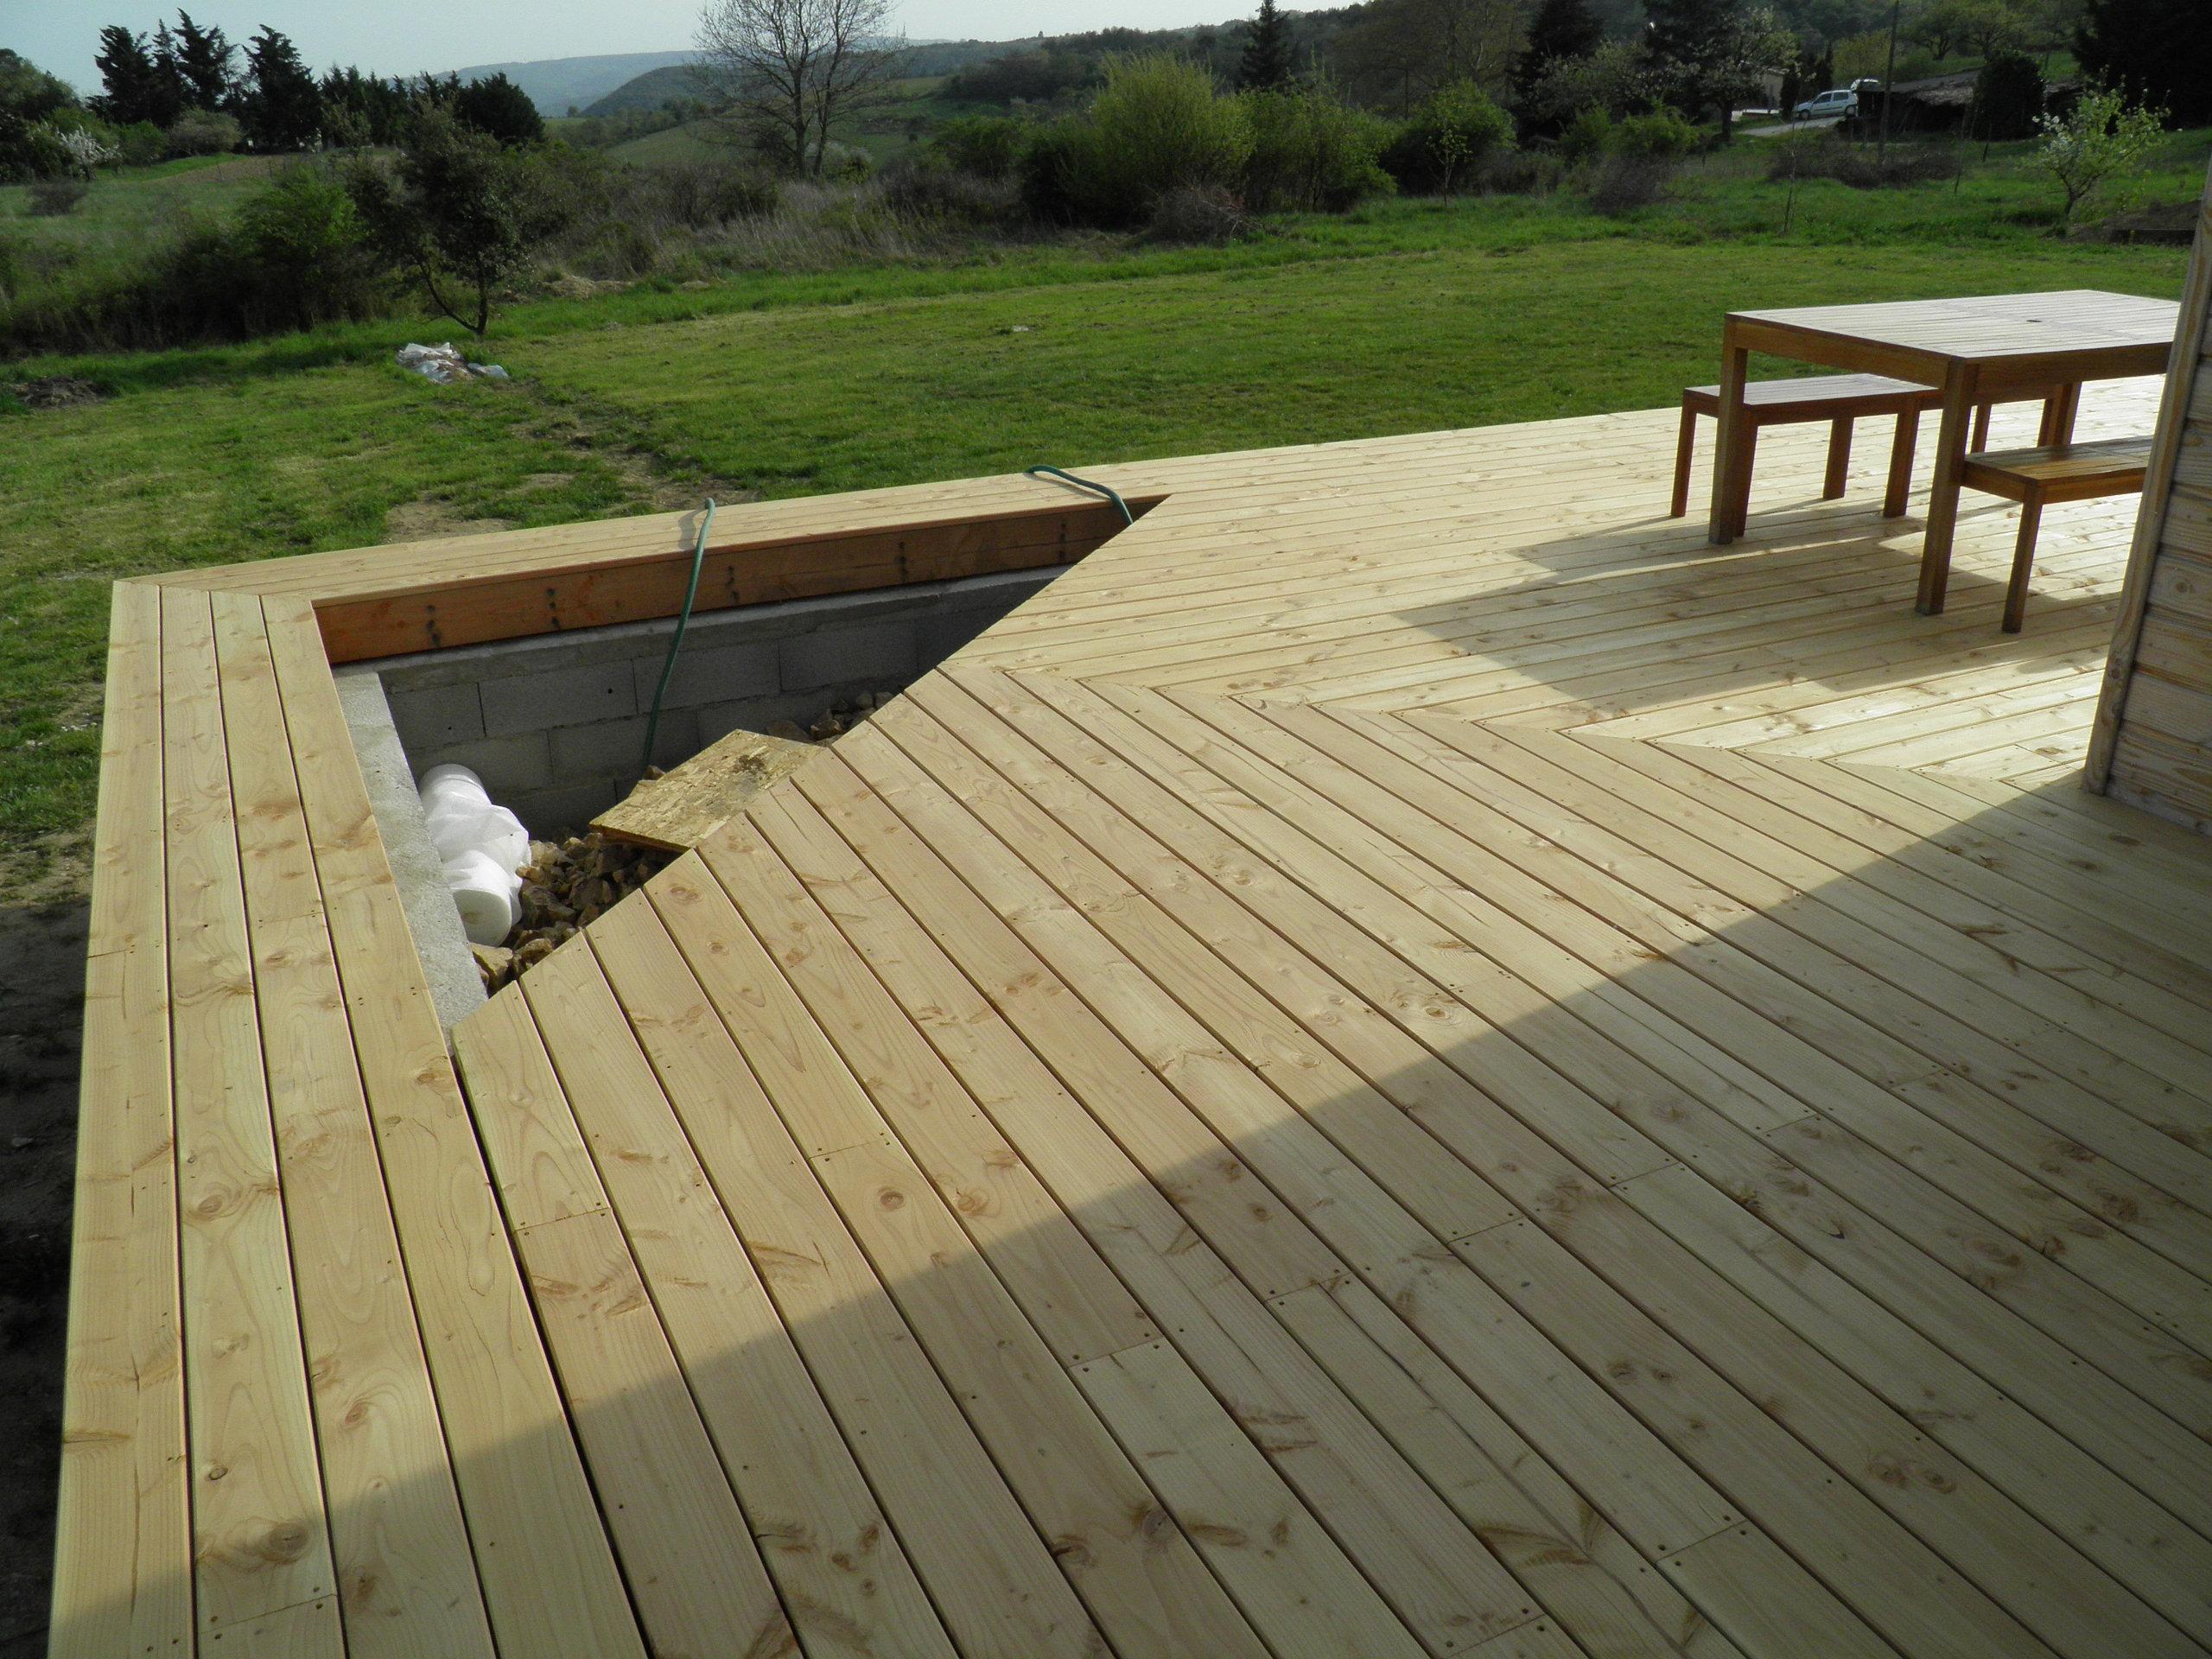 poseur artisan terrasses bois drome 26 terrasse bois douglas. Black Bedroom Furniture Sets. Home Design Ideas